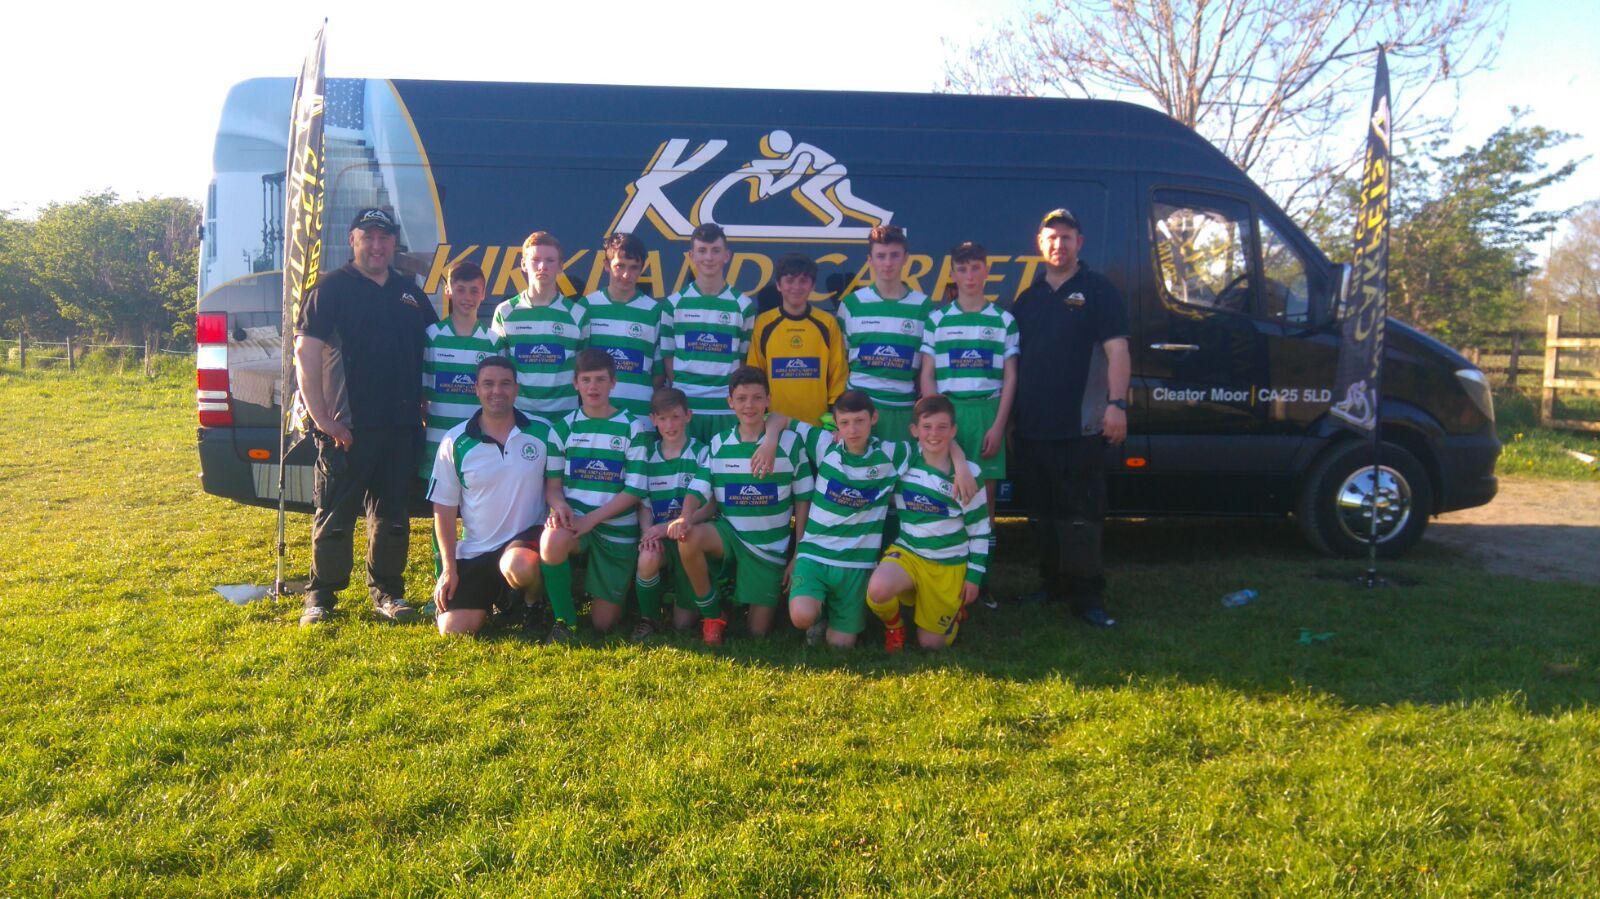 Sponsors of Cleator Moor Celtic Football Team